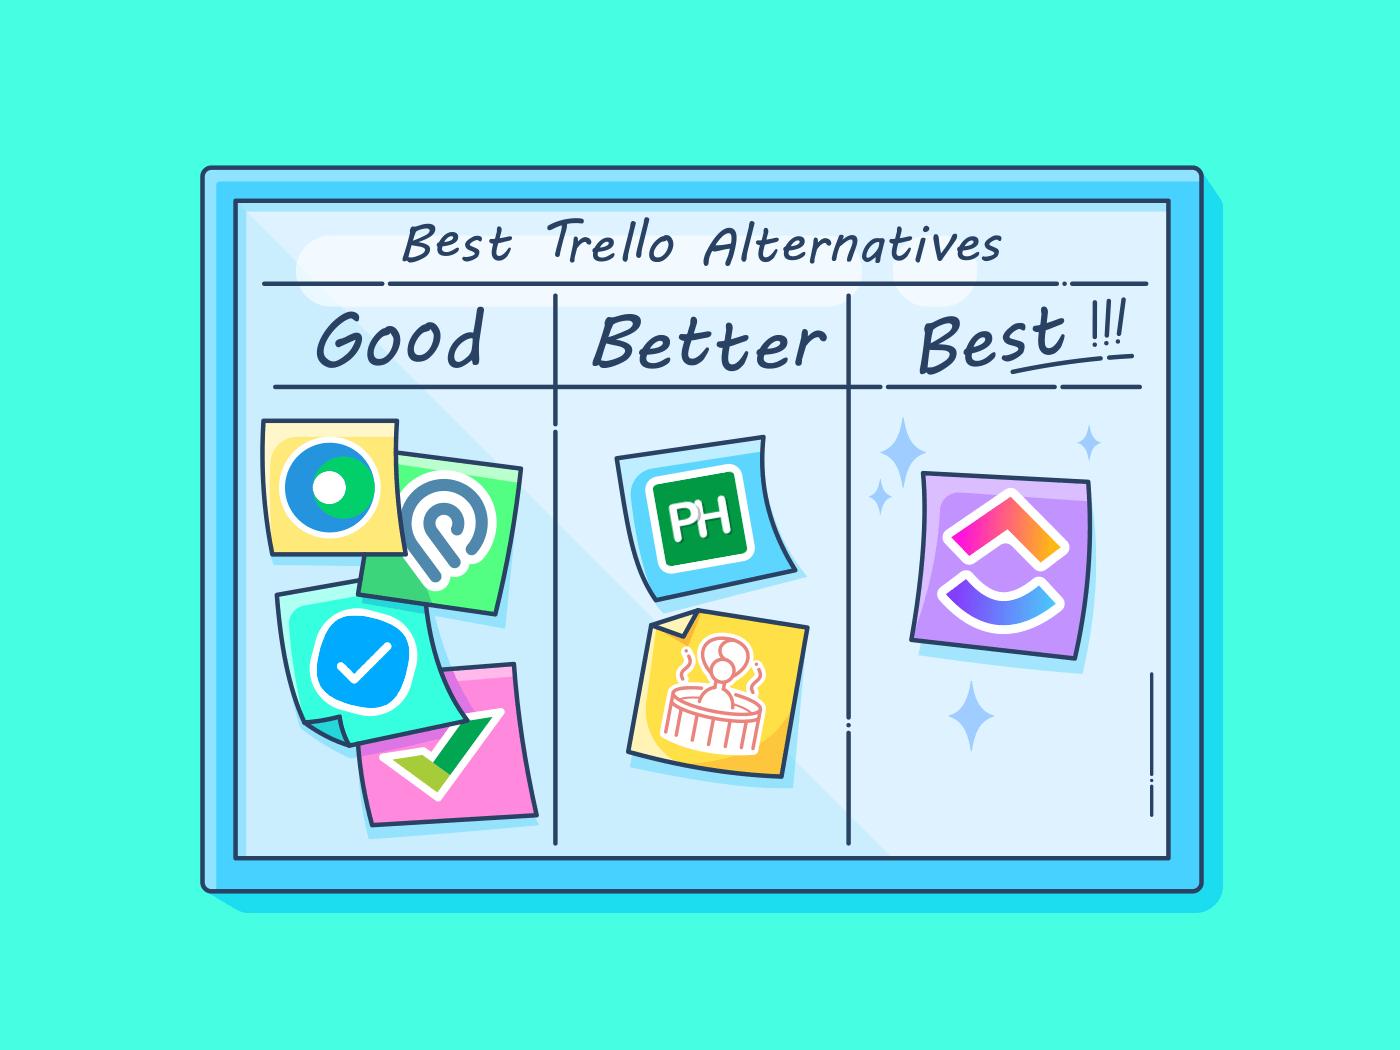 7 Best Trello Alternatives in 2020